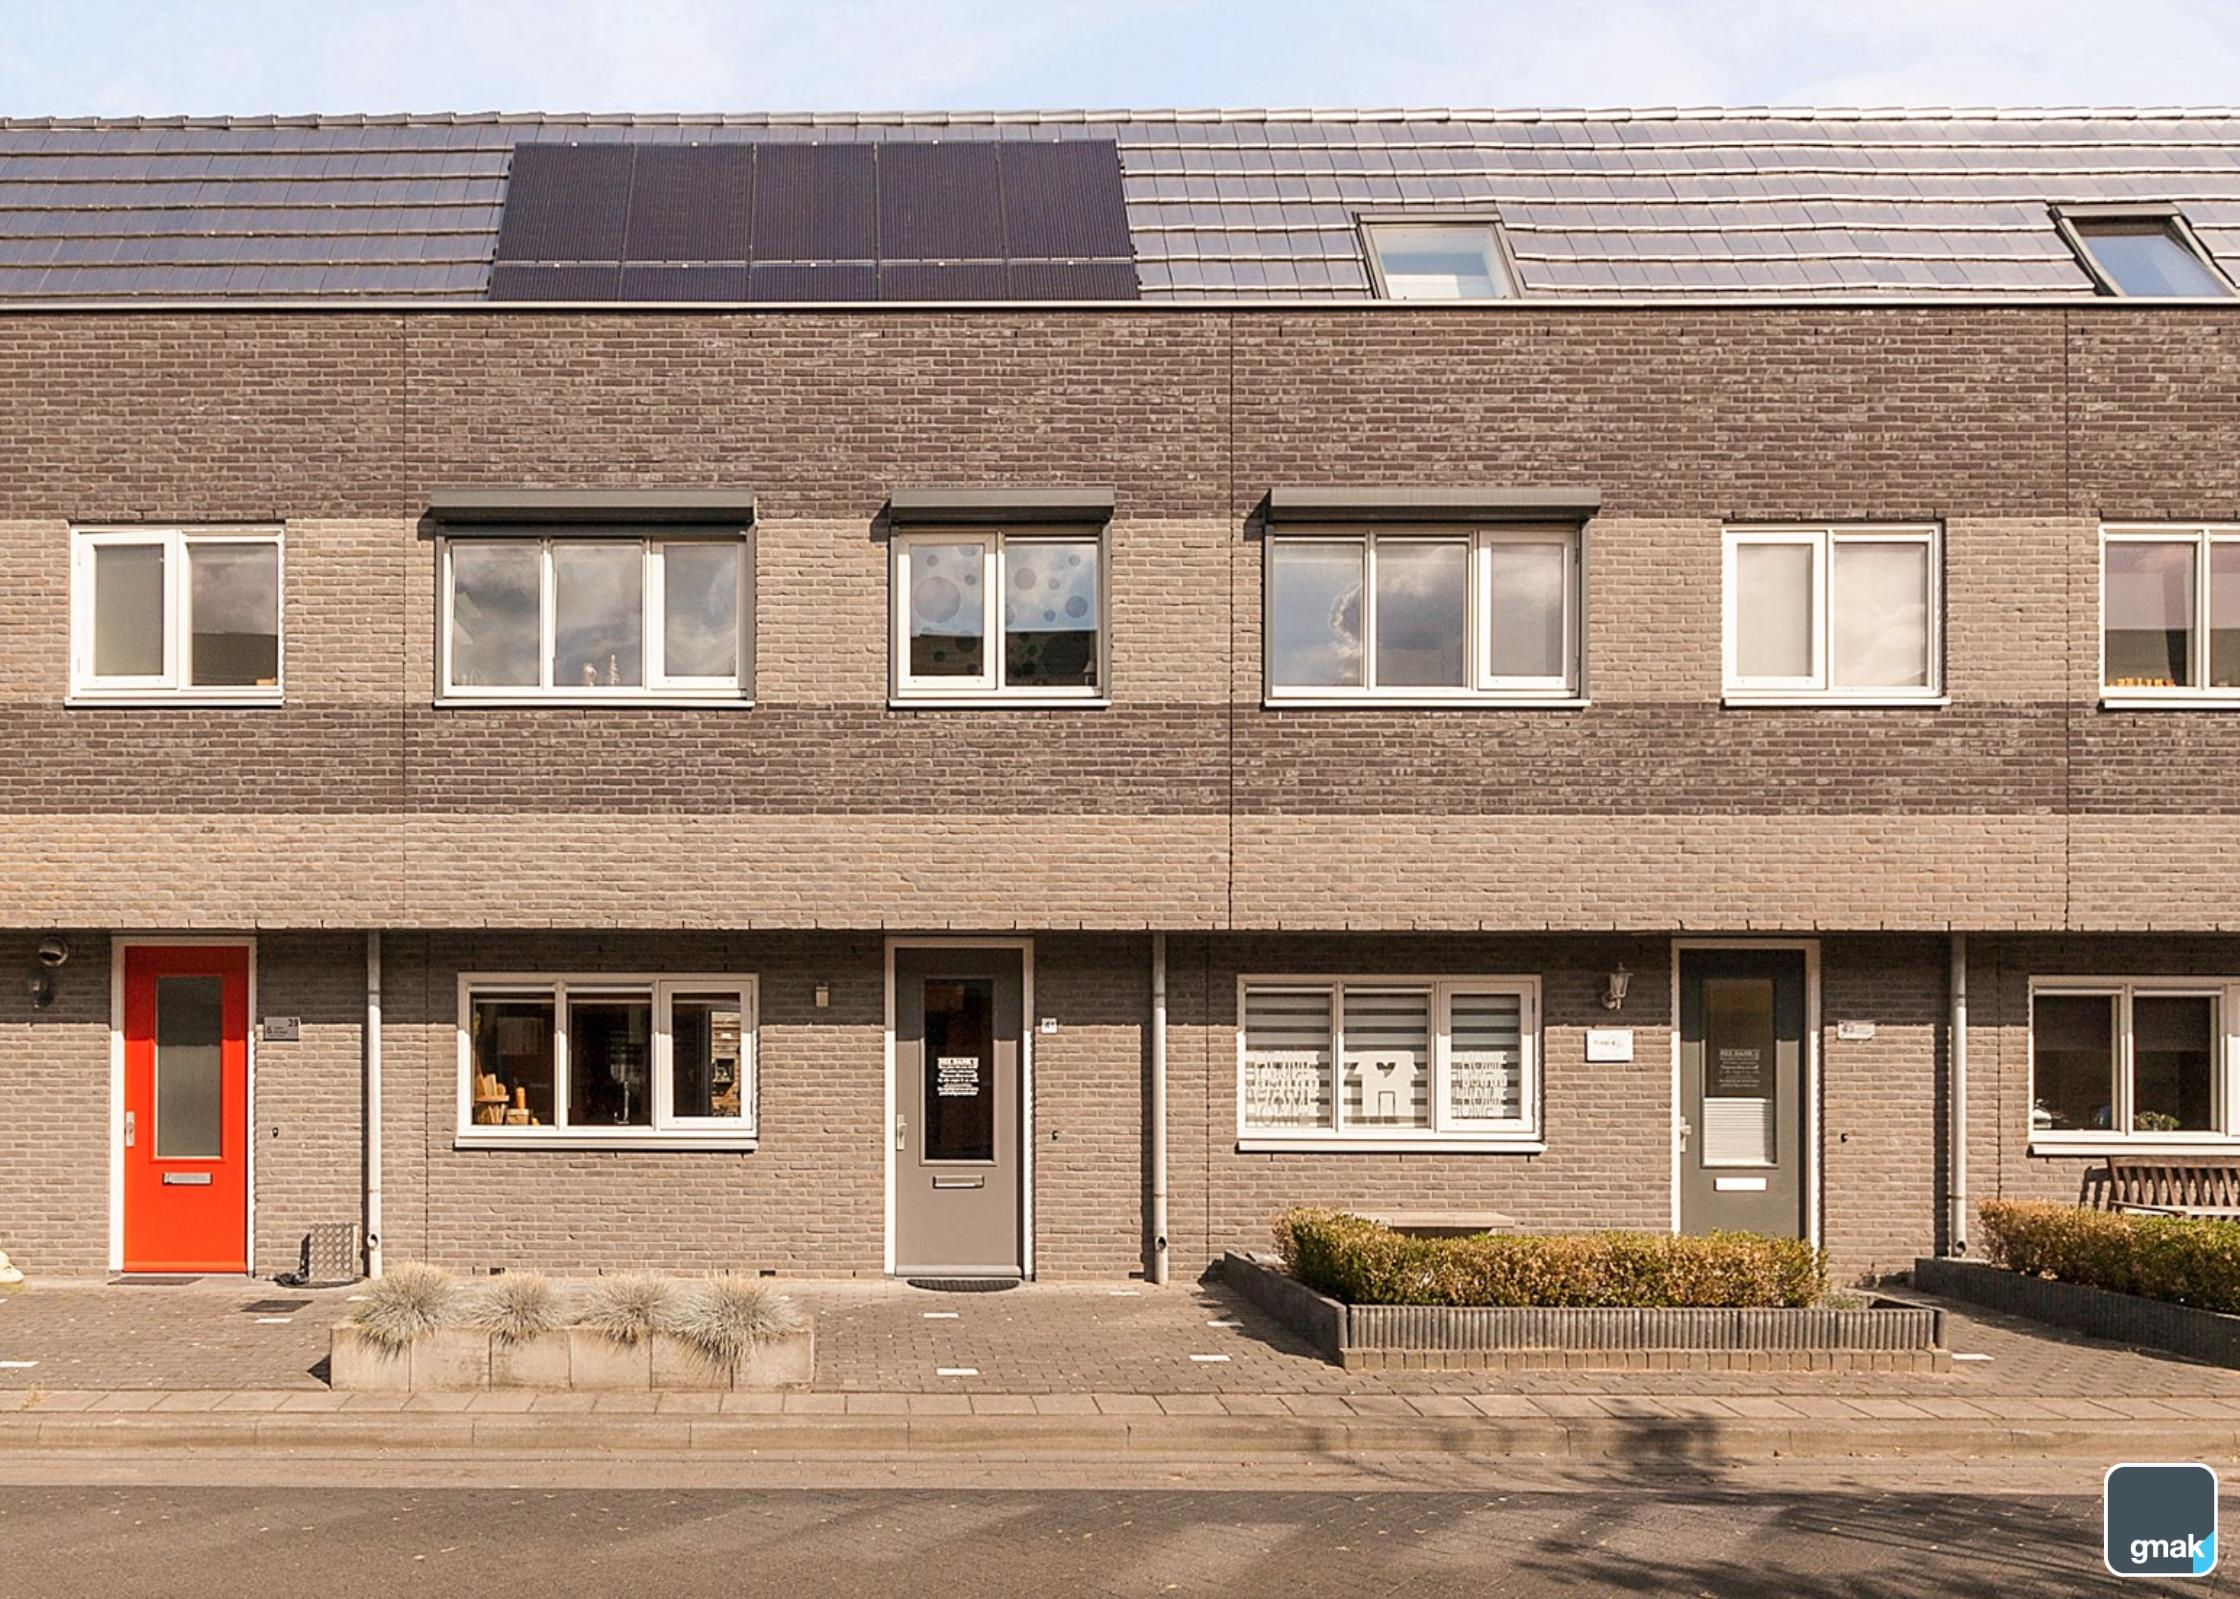 Woning aanzicht, zonnepanelen